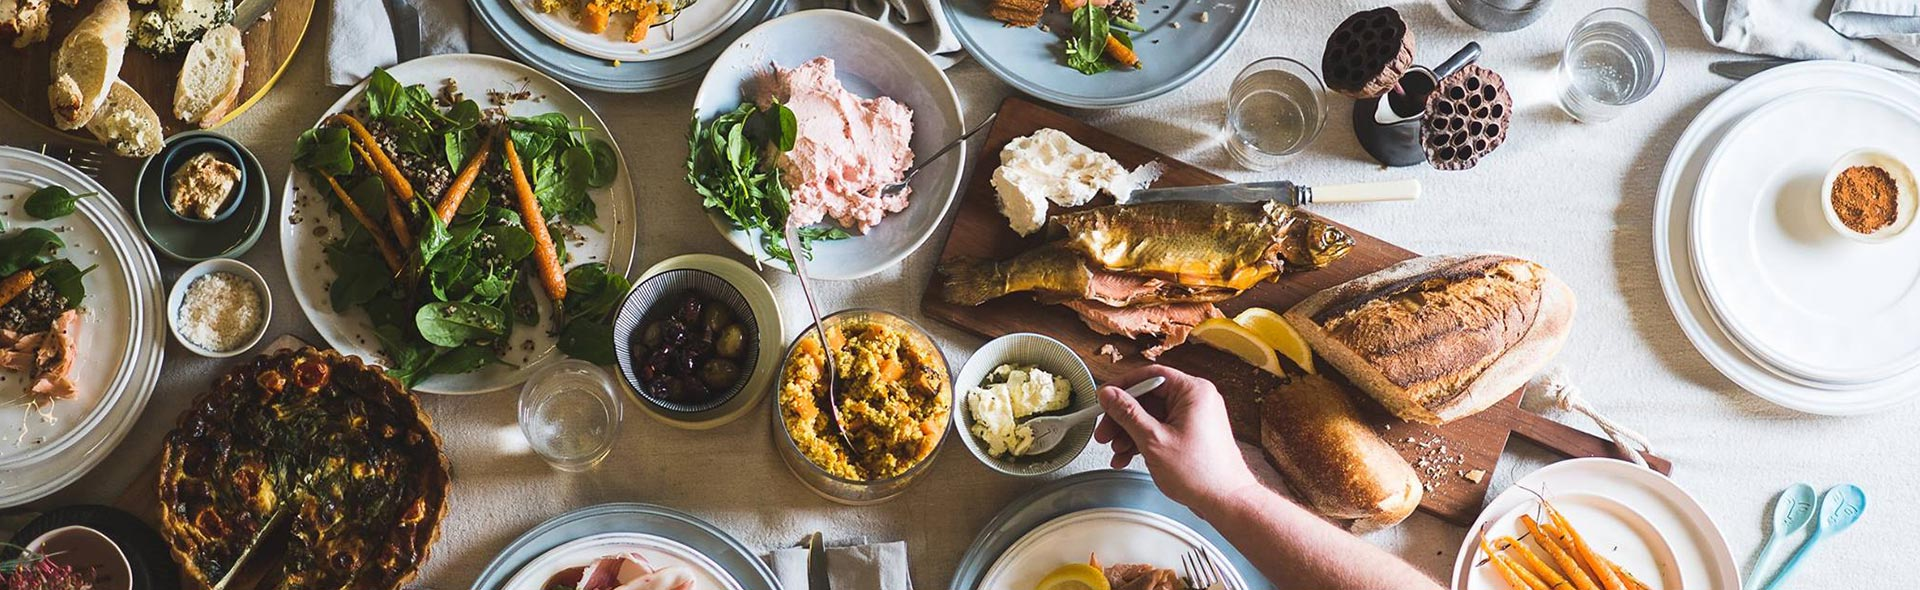 bernardis_fresh_food